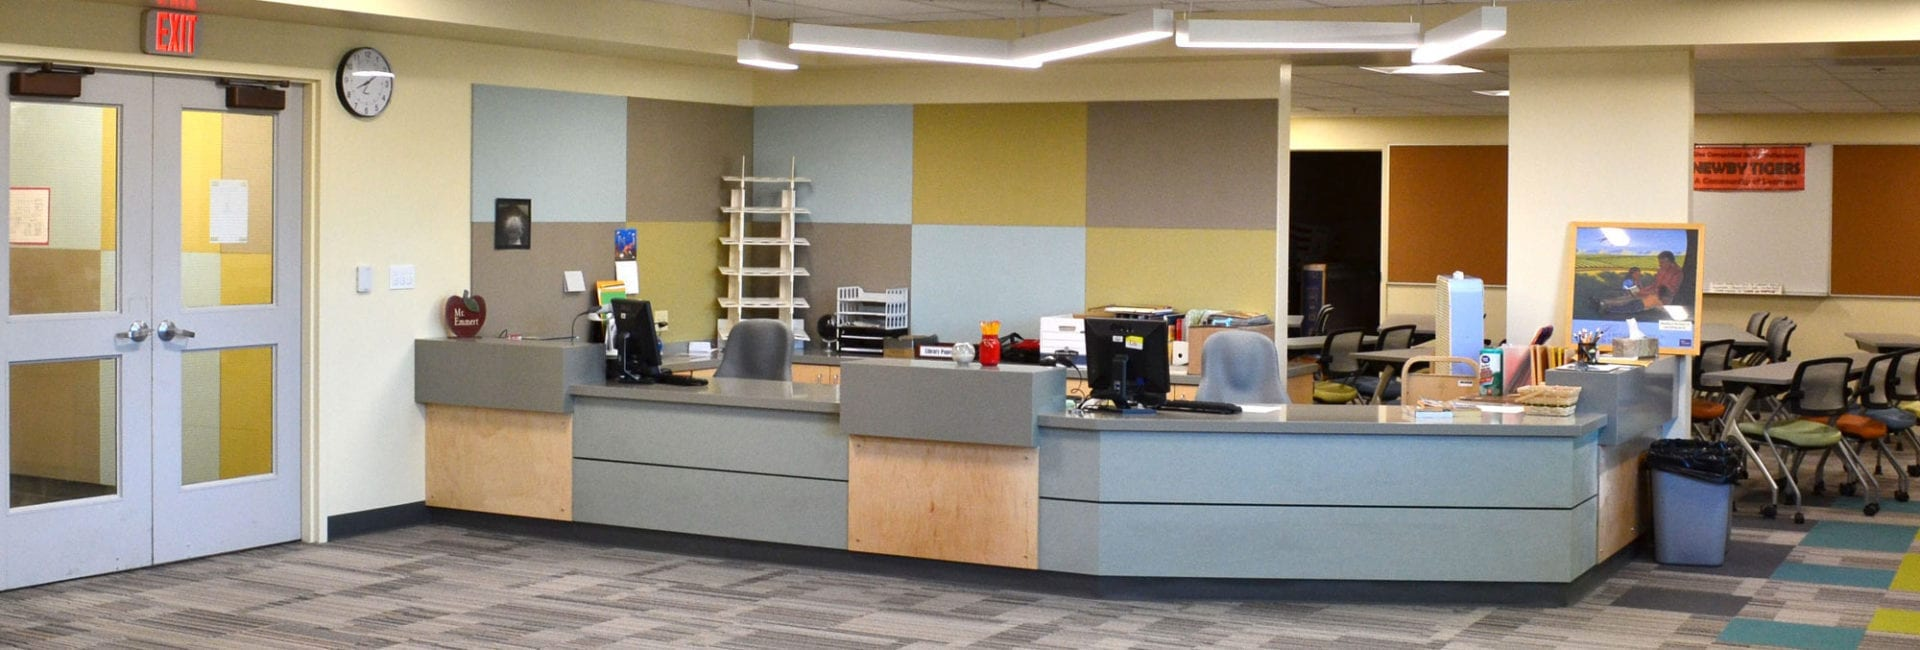 Duniway & Newby School Renovations